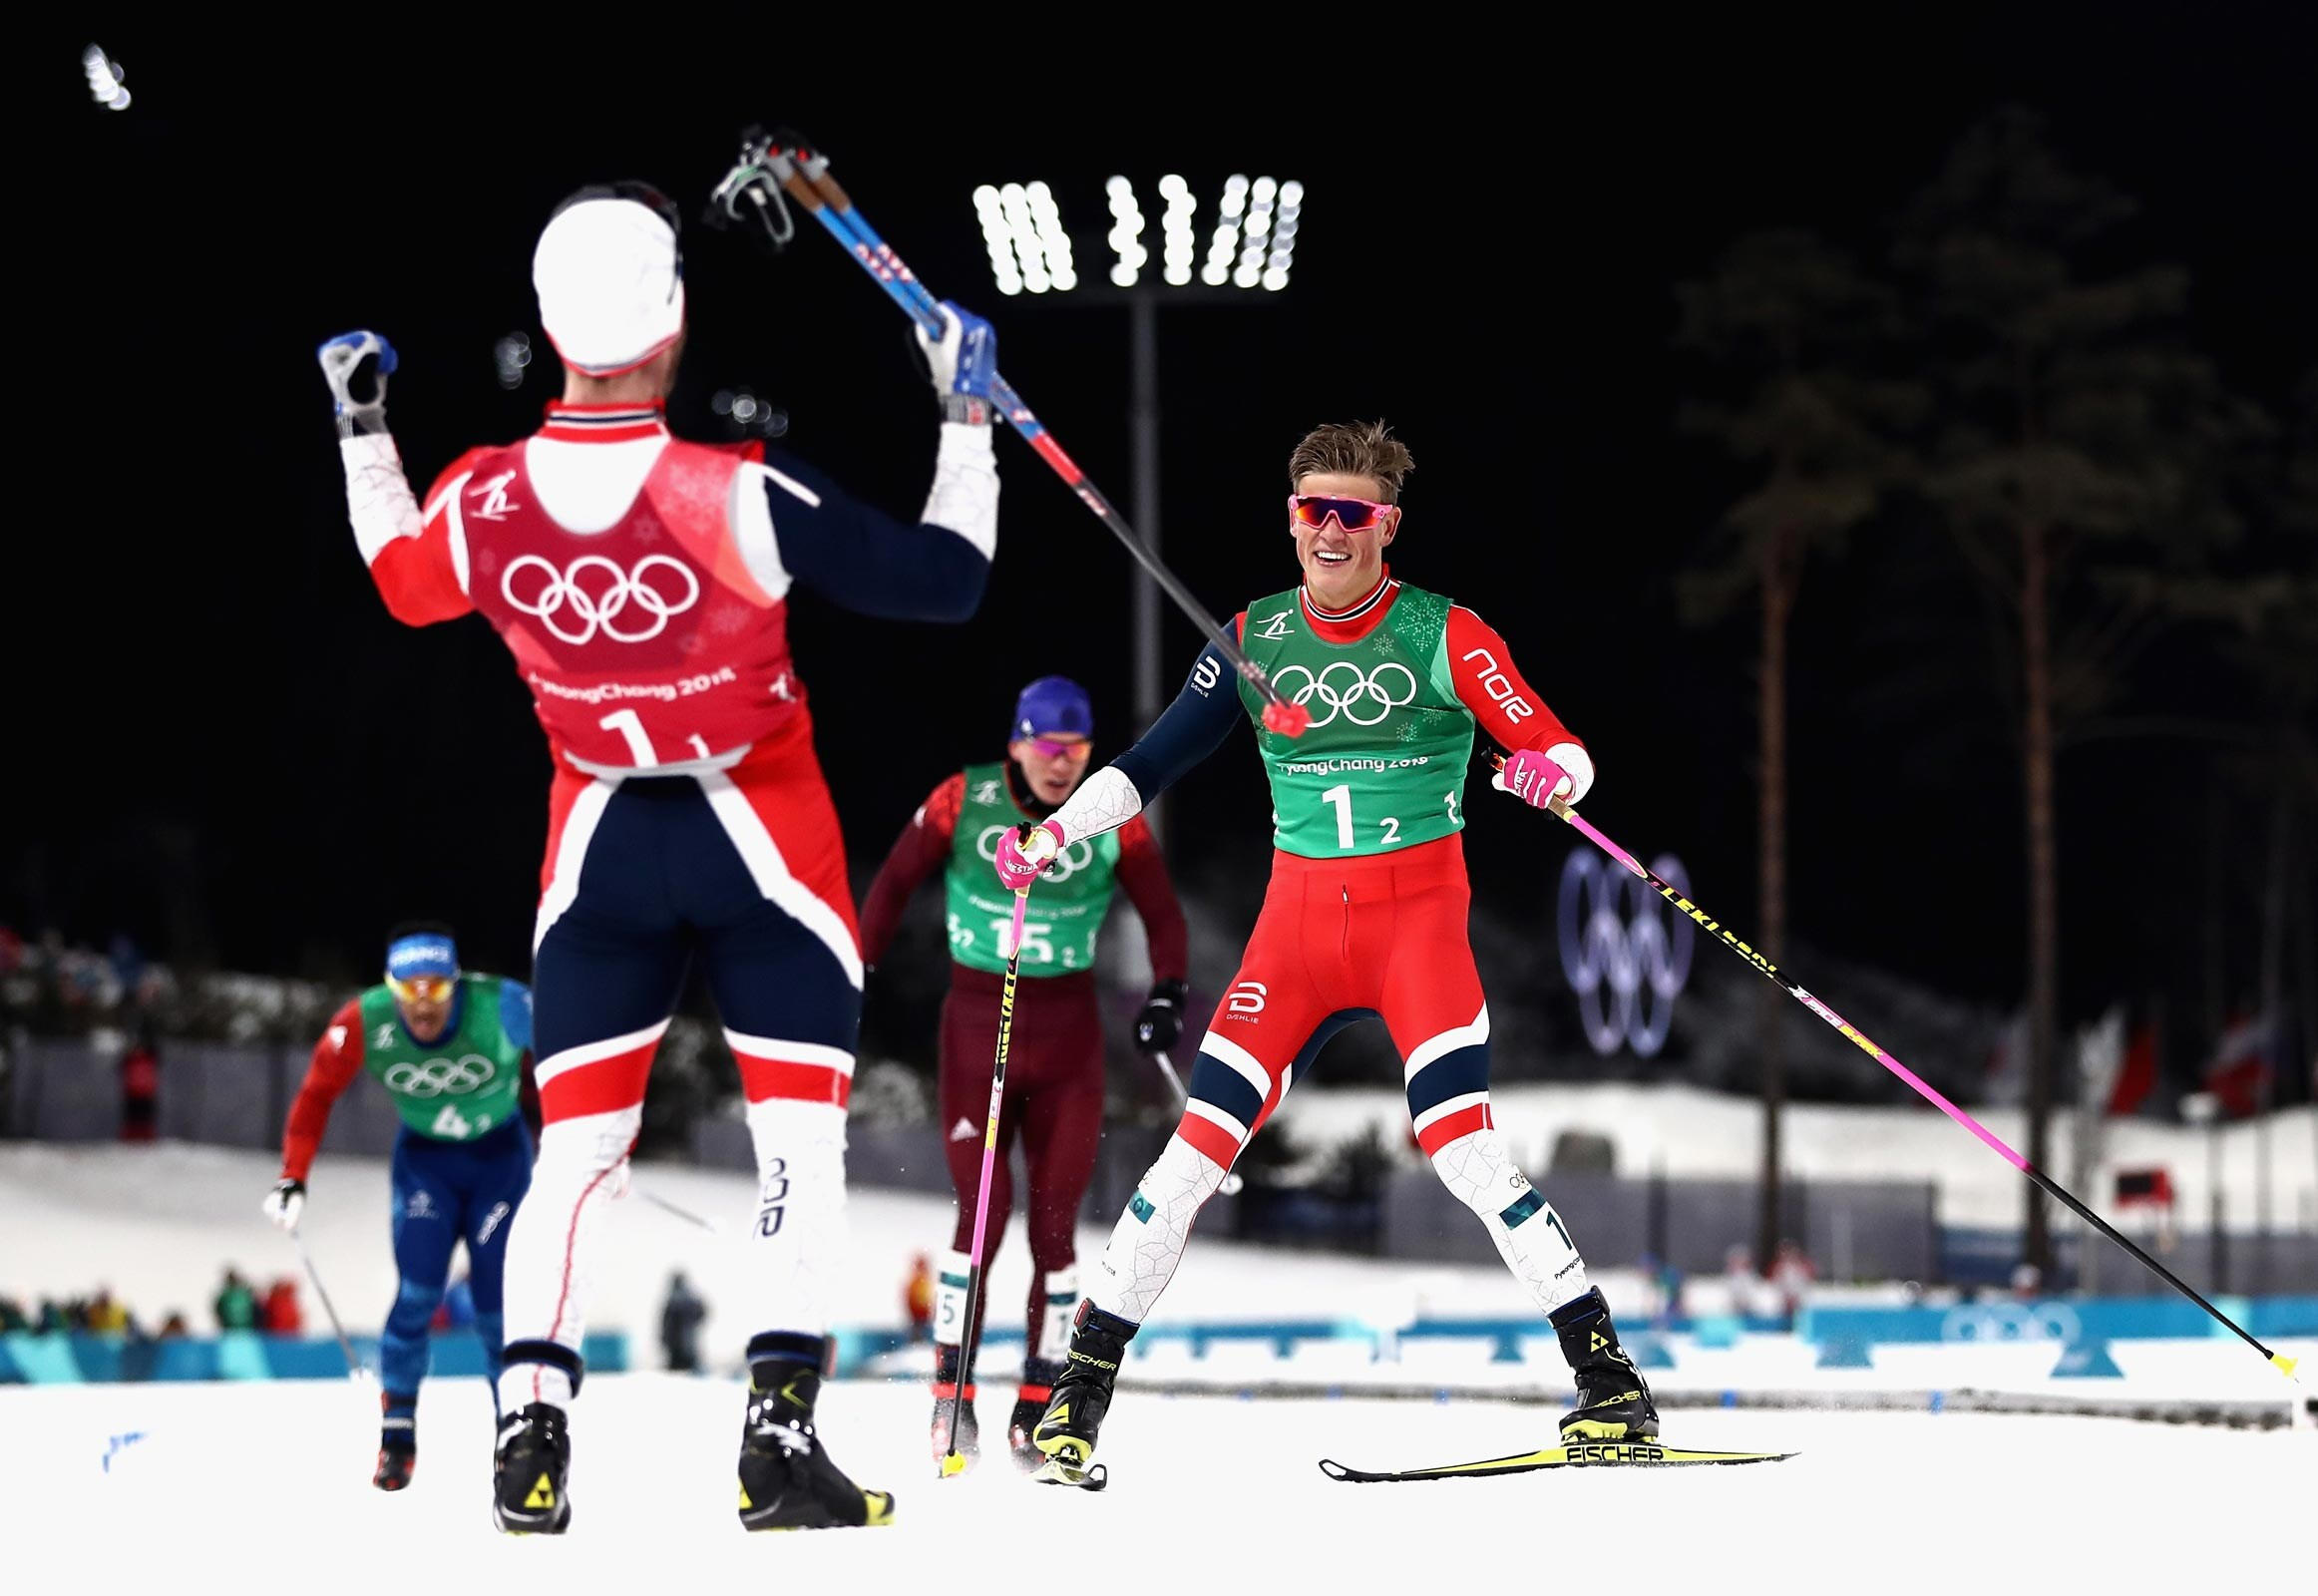 Cross-Country Skiing - Men's Team Sprint Free